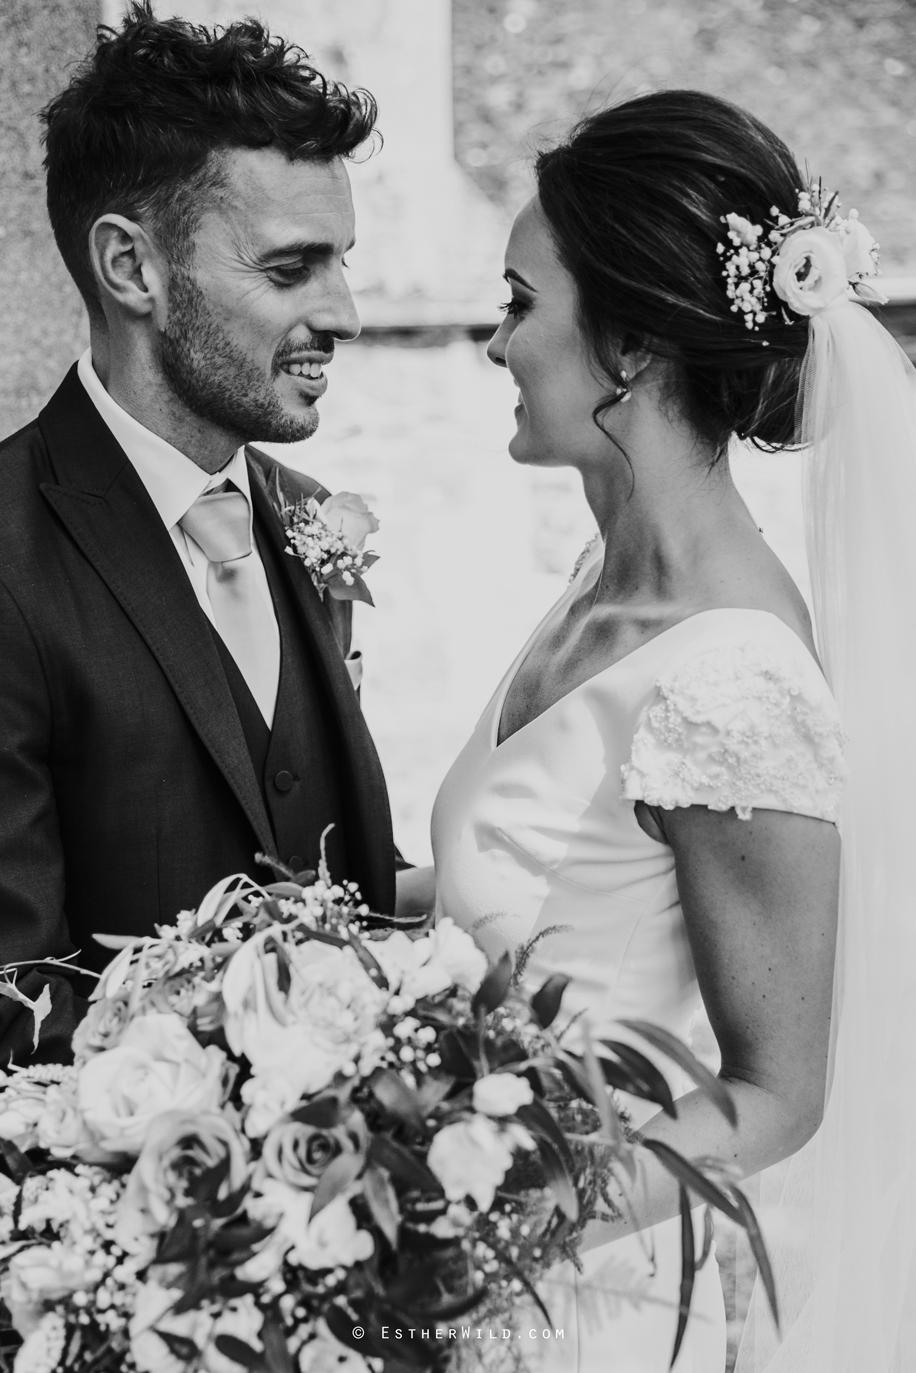 Wootton_Wedding_Copyright_Esther_Wild_Photographer_IMG_1438-2.jpg